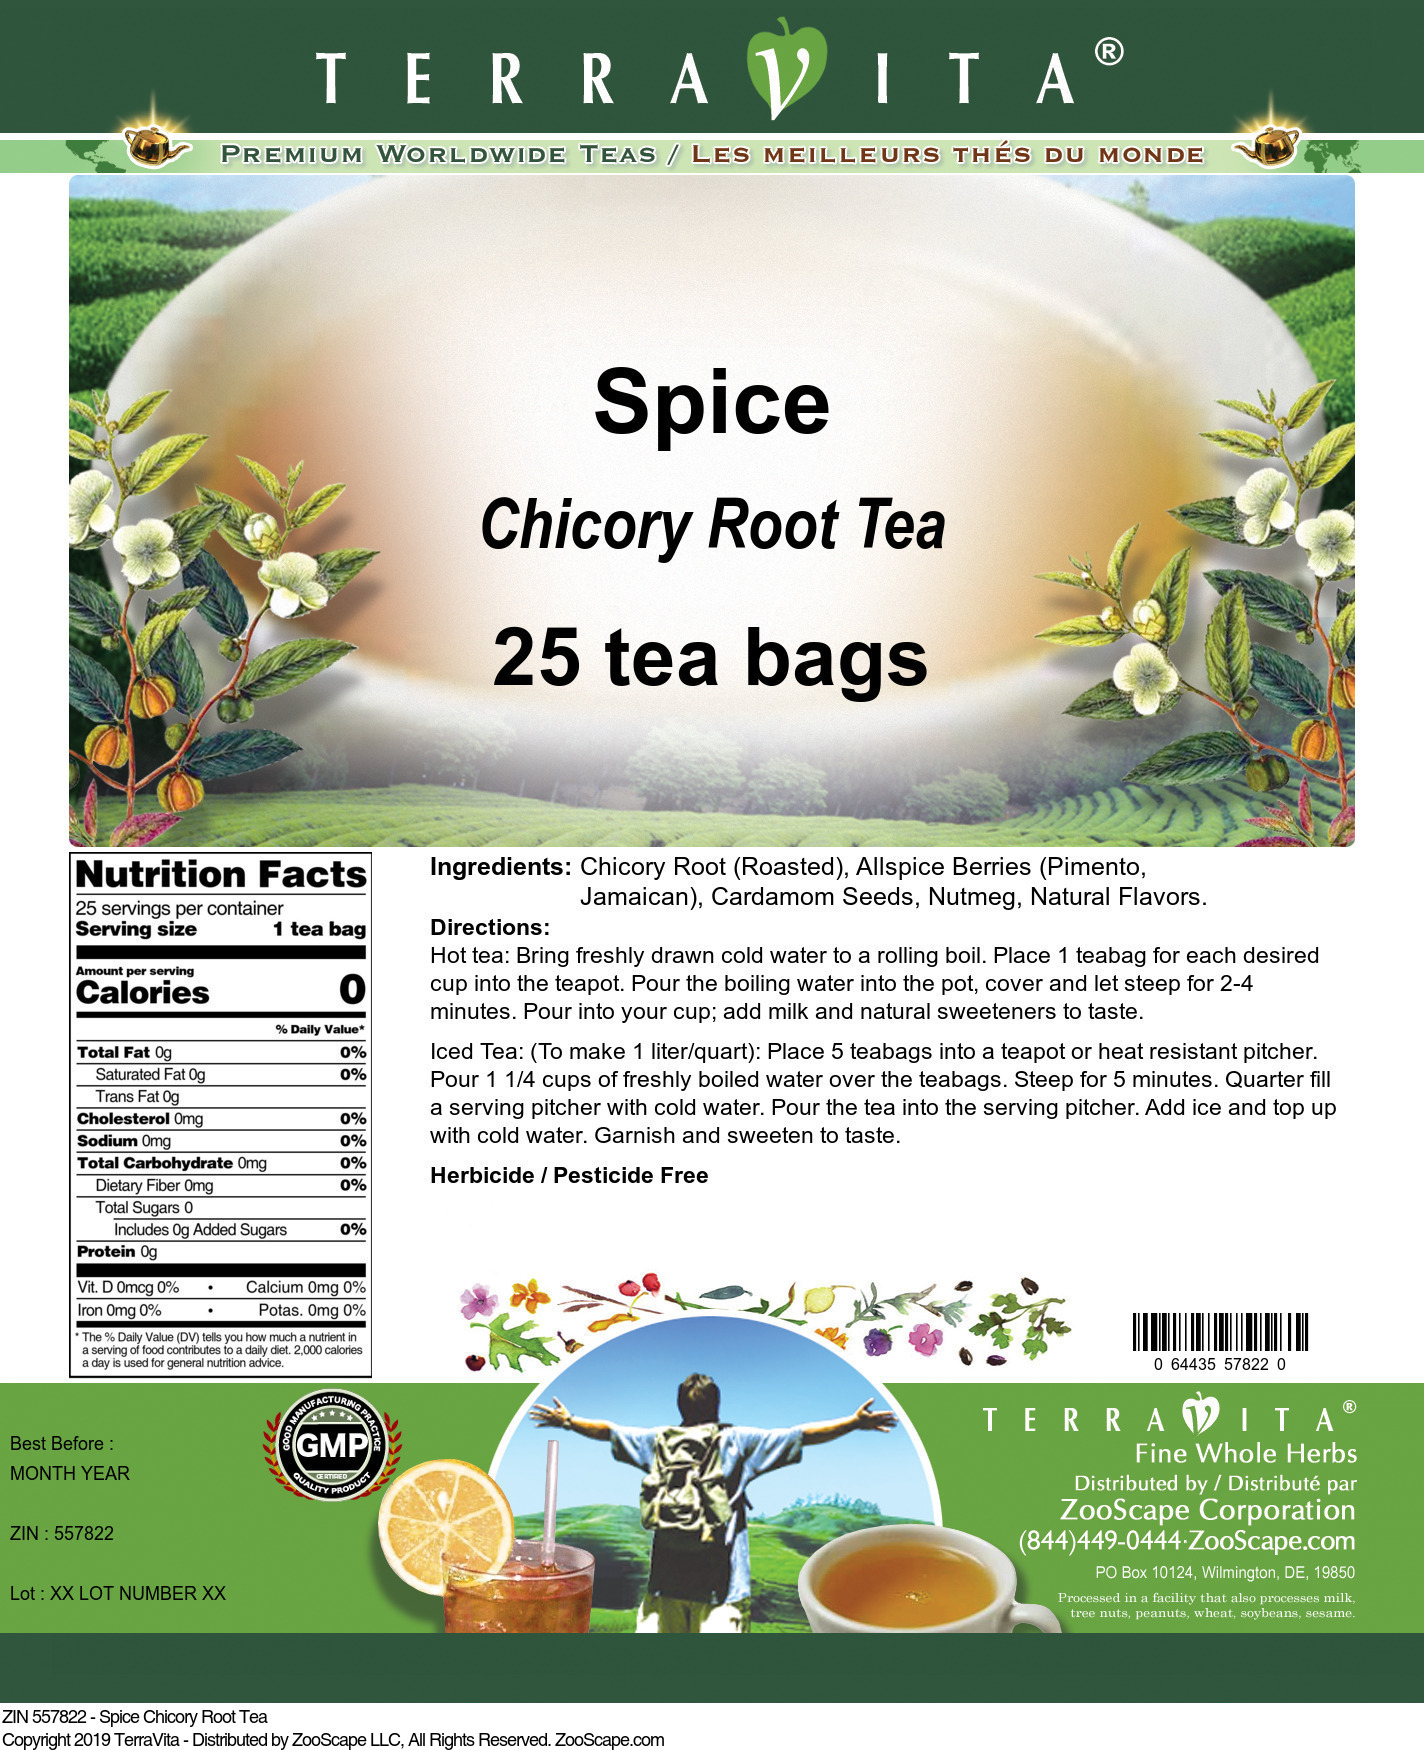 Spice Chicory Root Tea